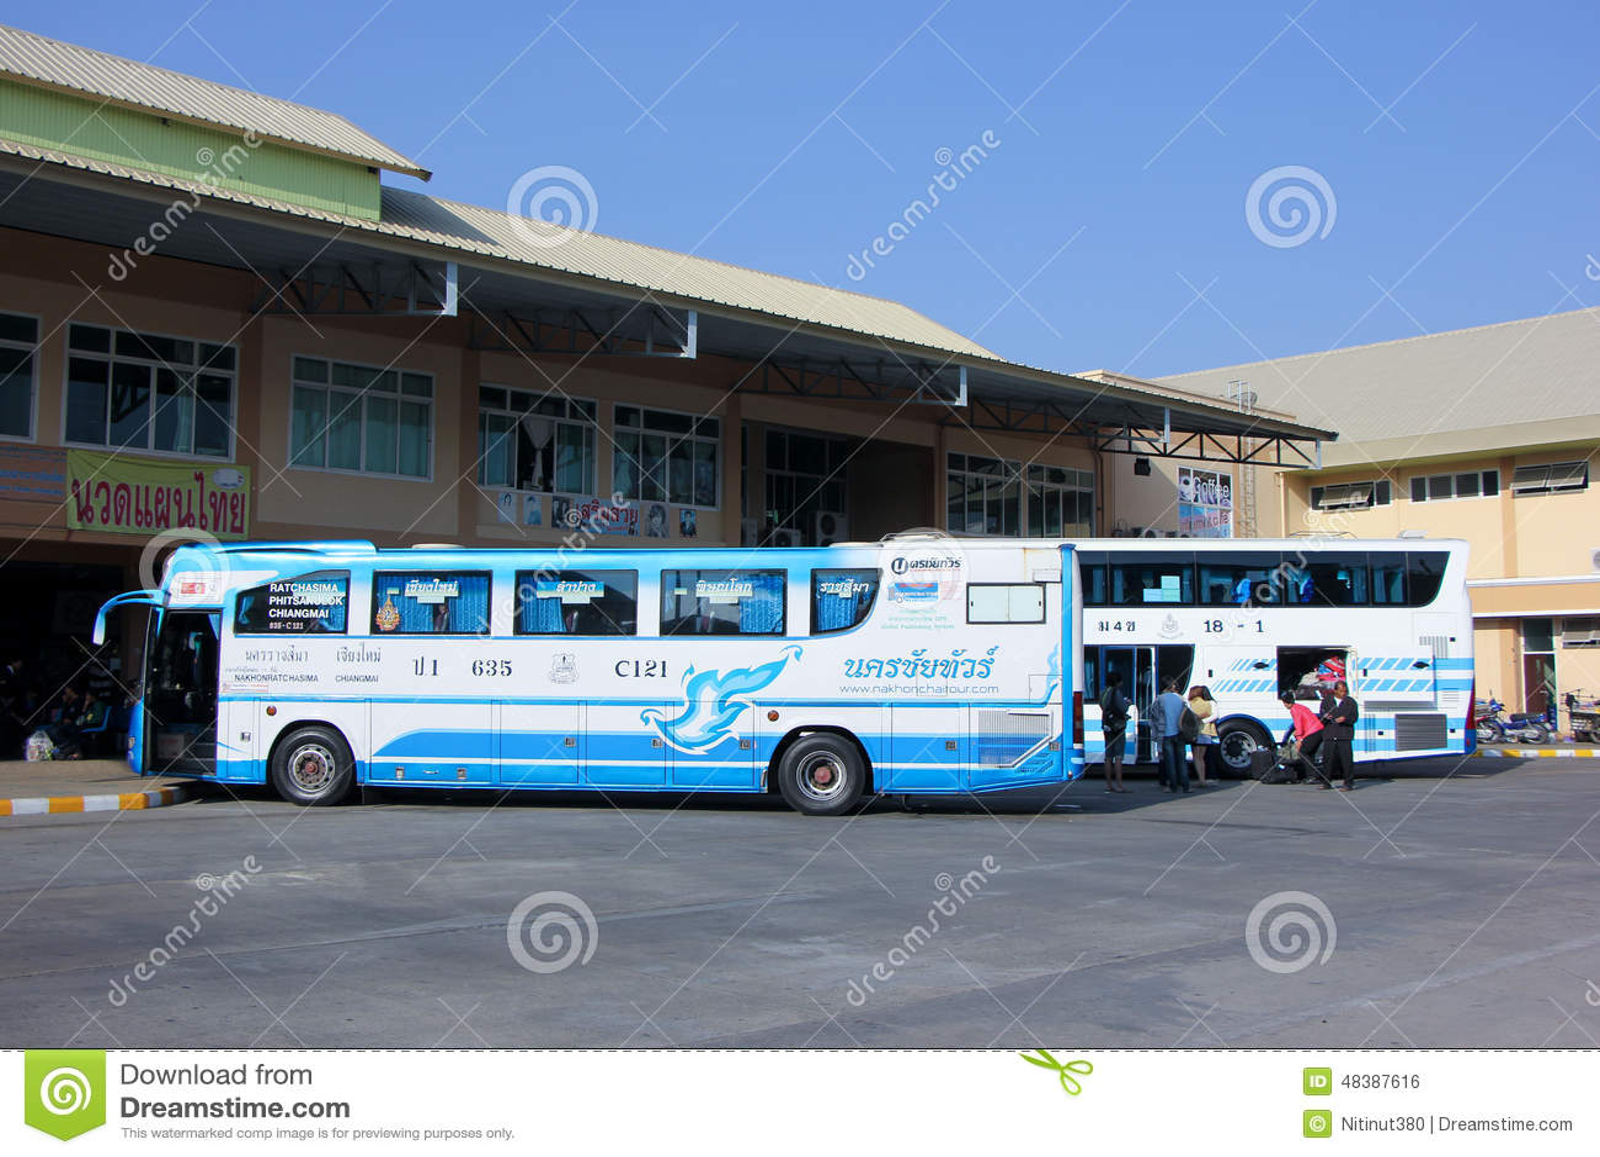 Nakhonchai tour editorial photo image 48387616 for Mercedes benz tour bus